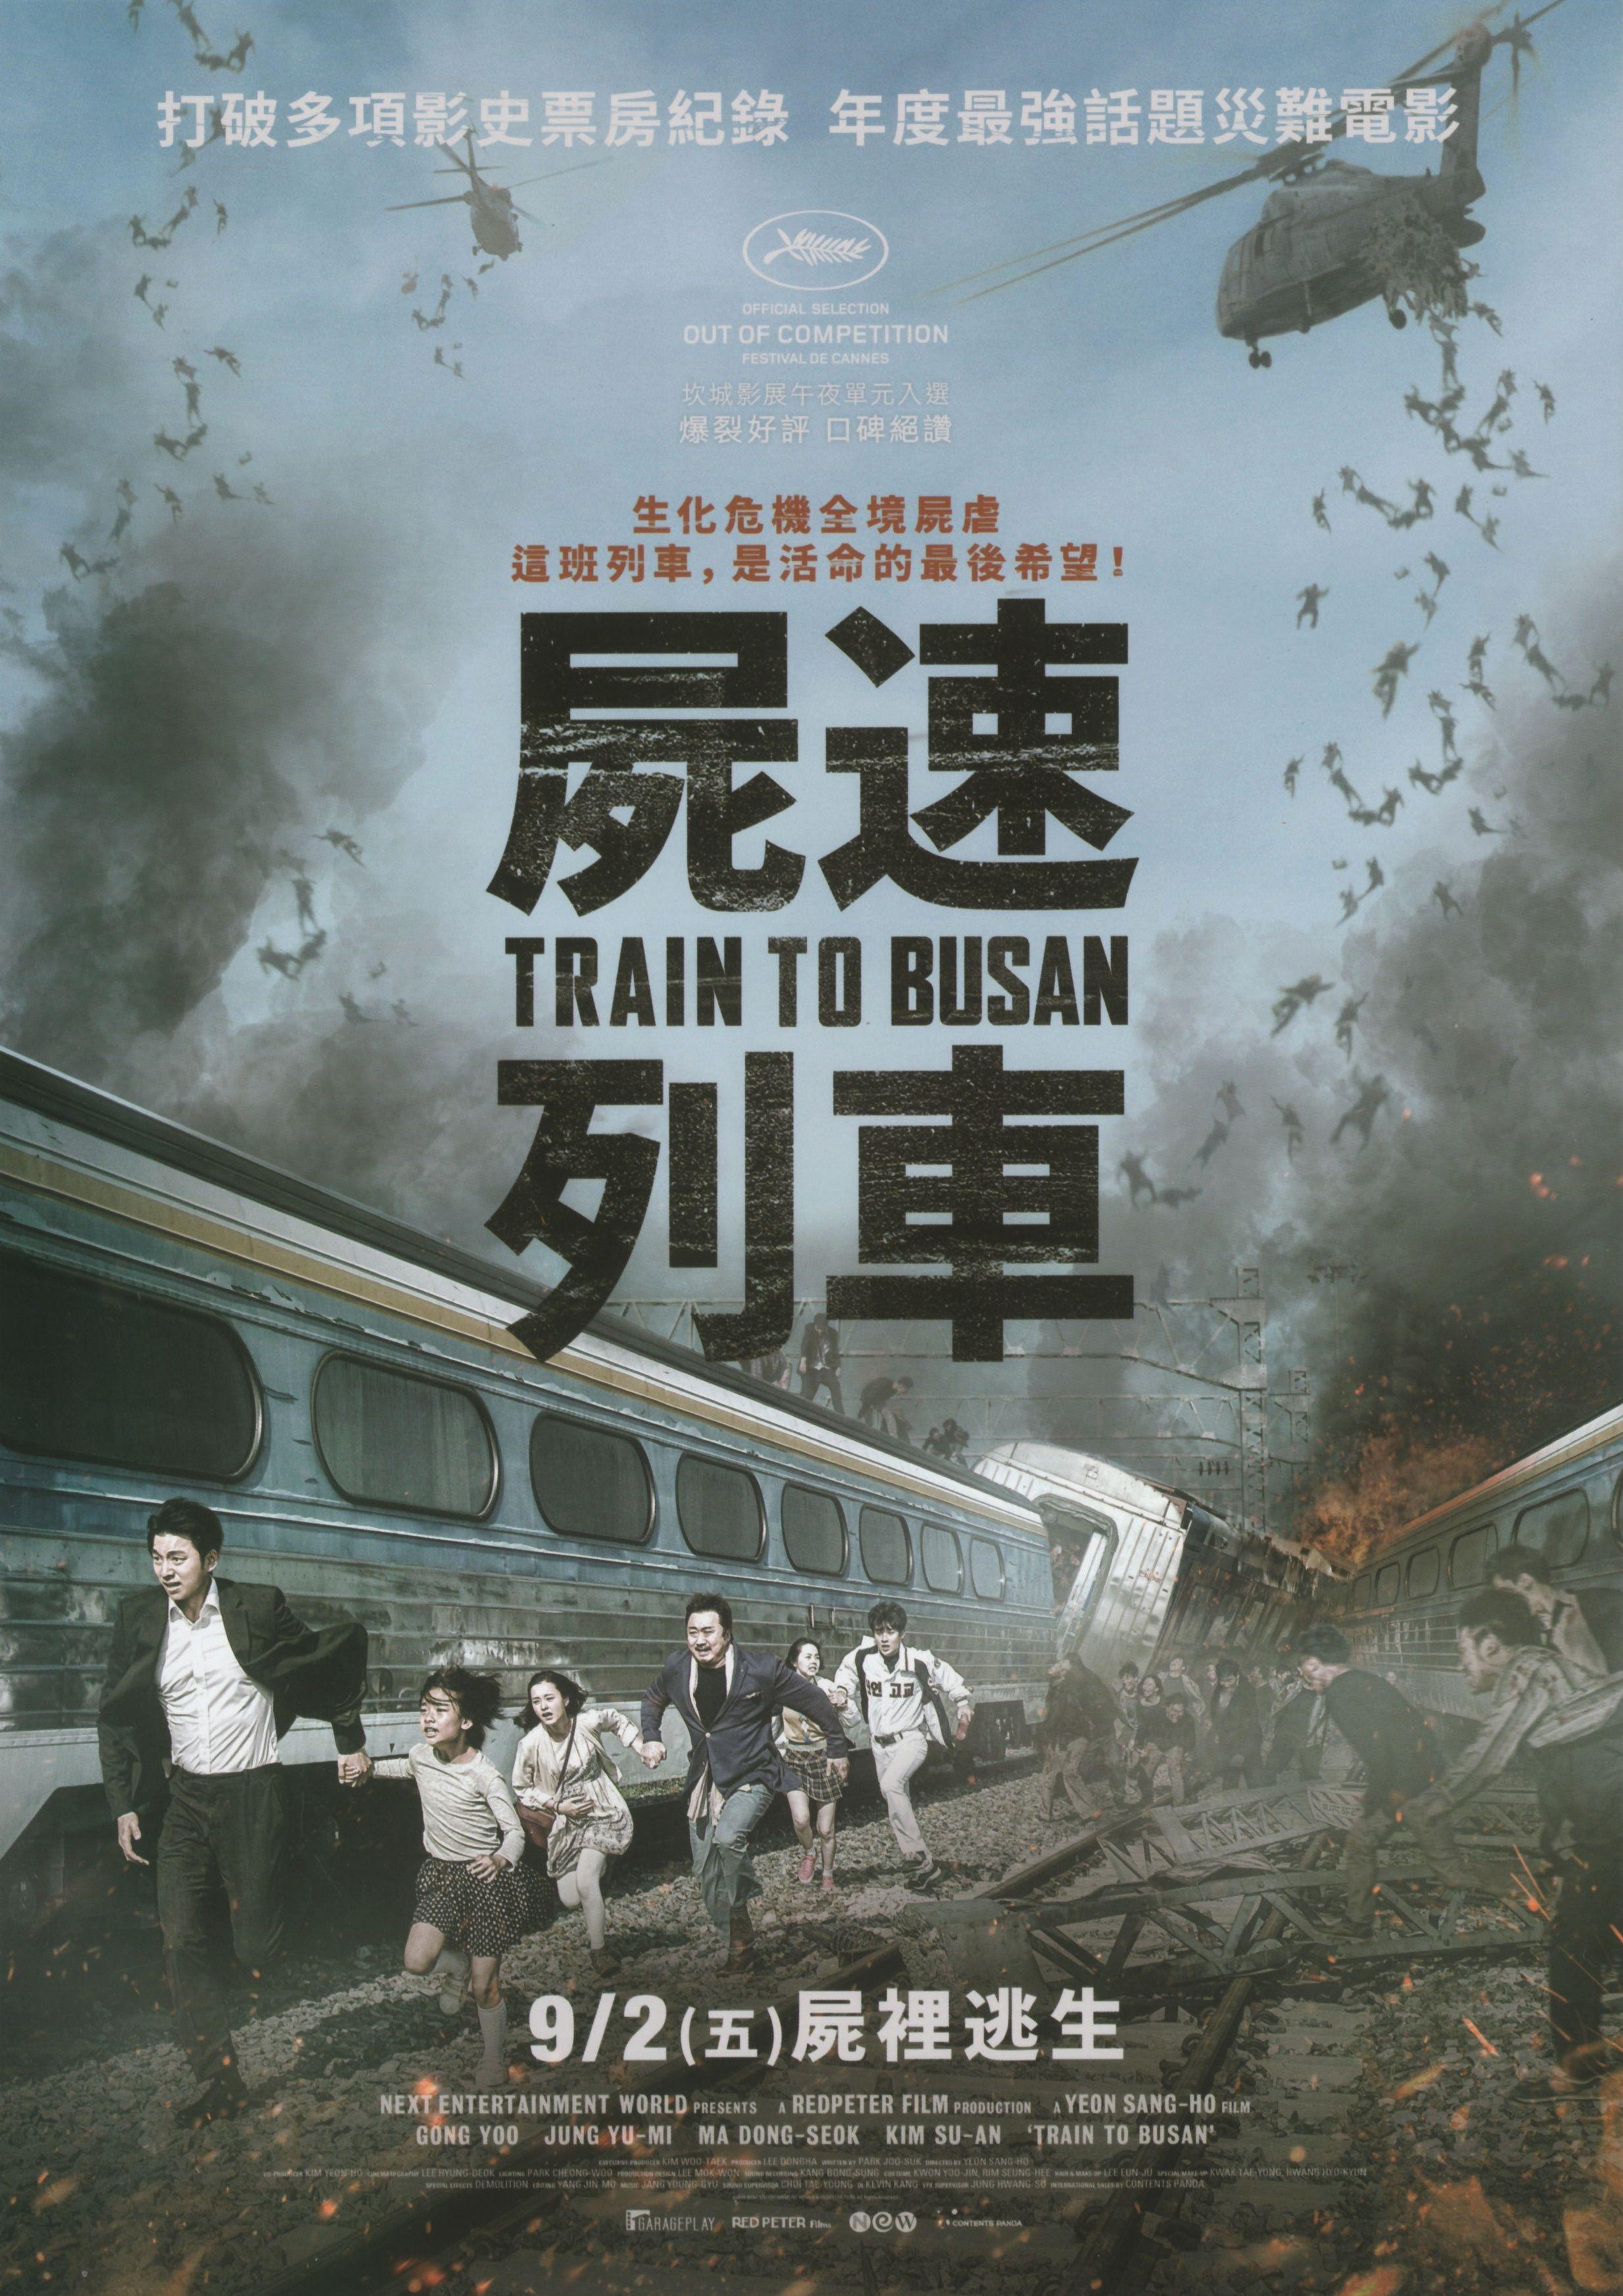 Best Anime Racing Movie Tagalog Dubbed 2020 Movies Tagalog Anime Movies